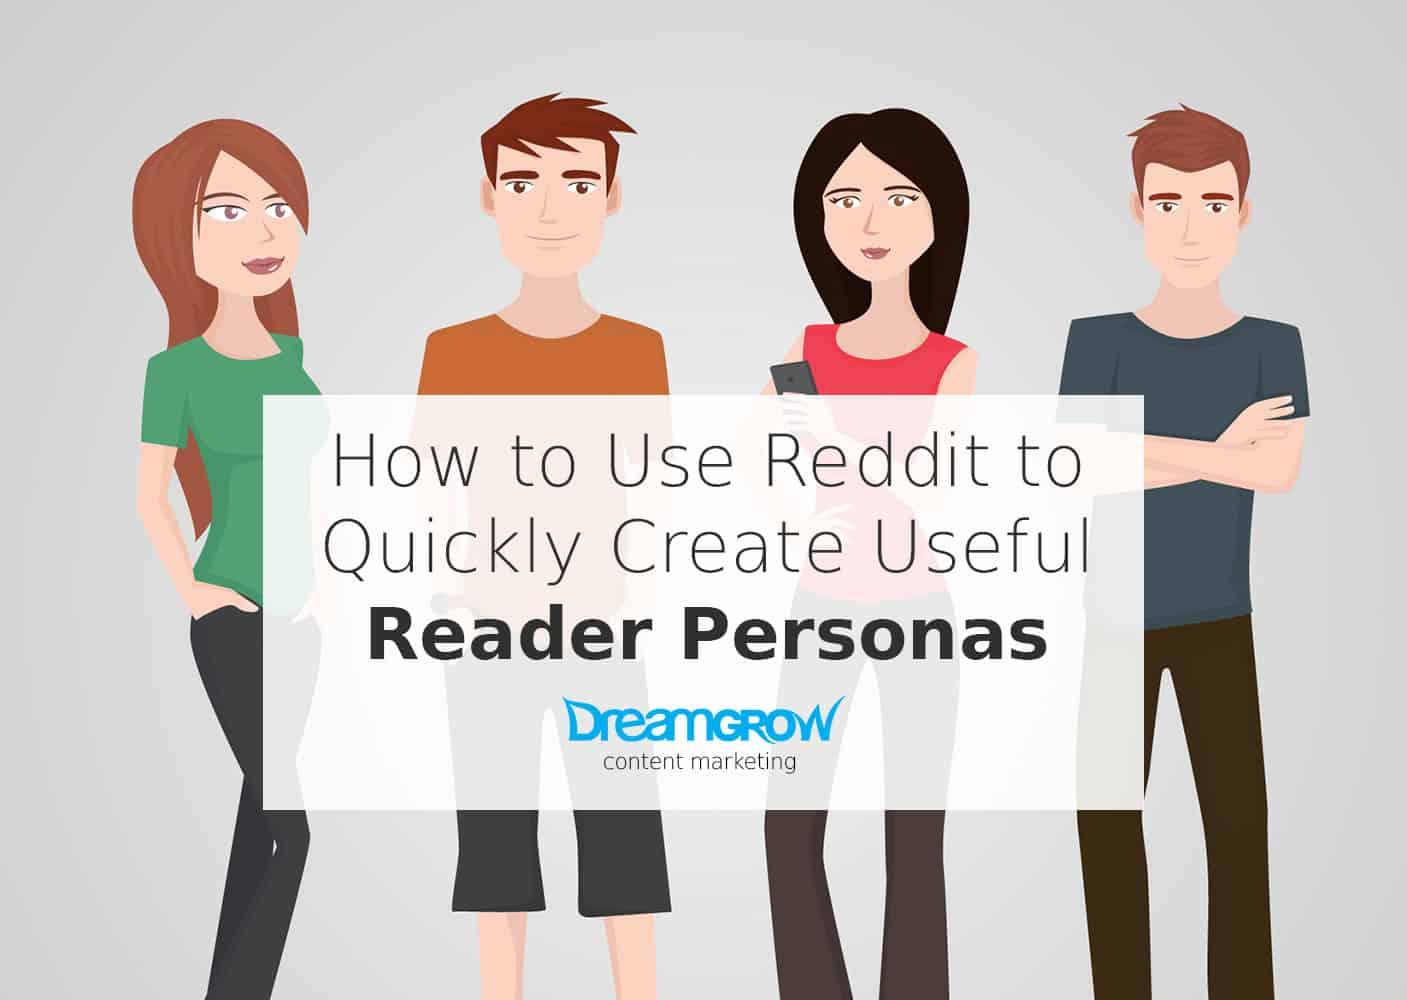 create reader personas with reddit